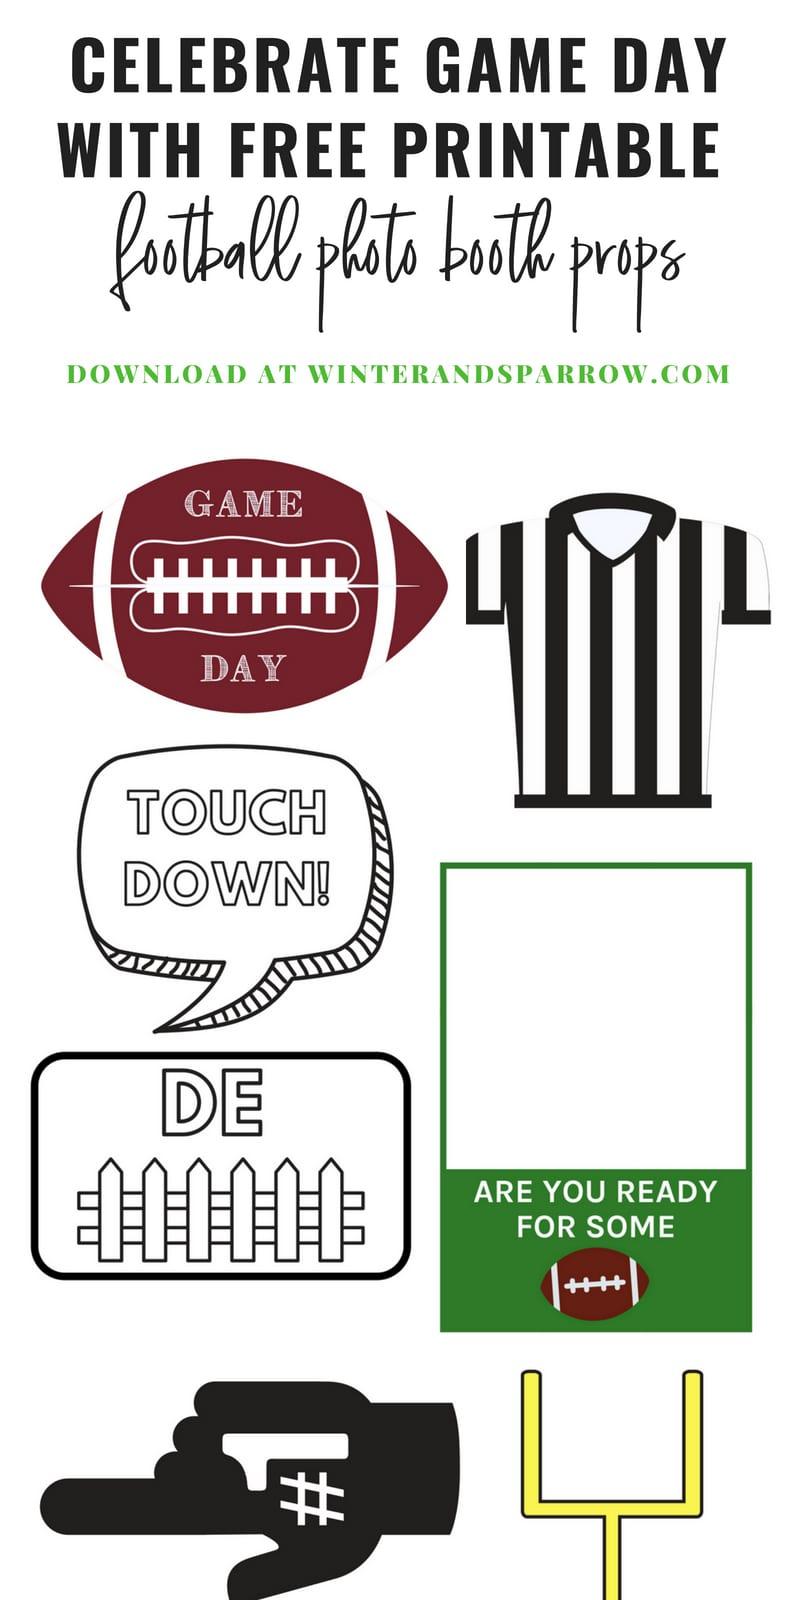 Celebrate Game Day With Free Printable Football Photo Booth Props   winterandsparrow.com #photobooth #footballseason #fridaynightlights